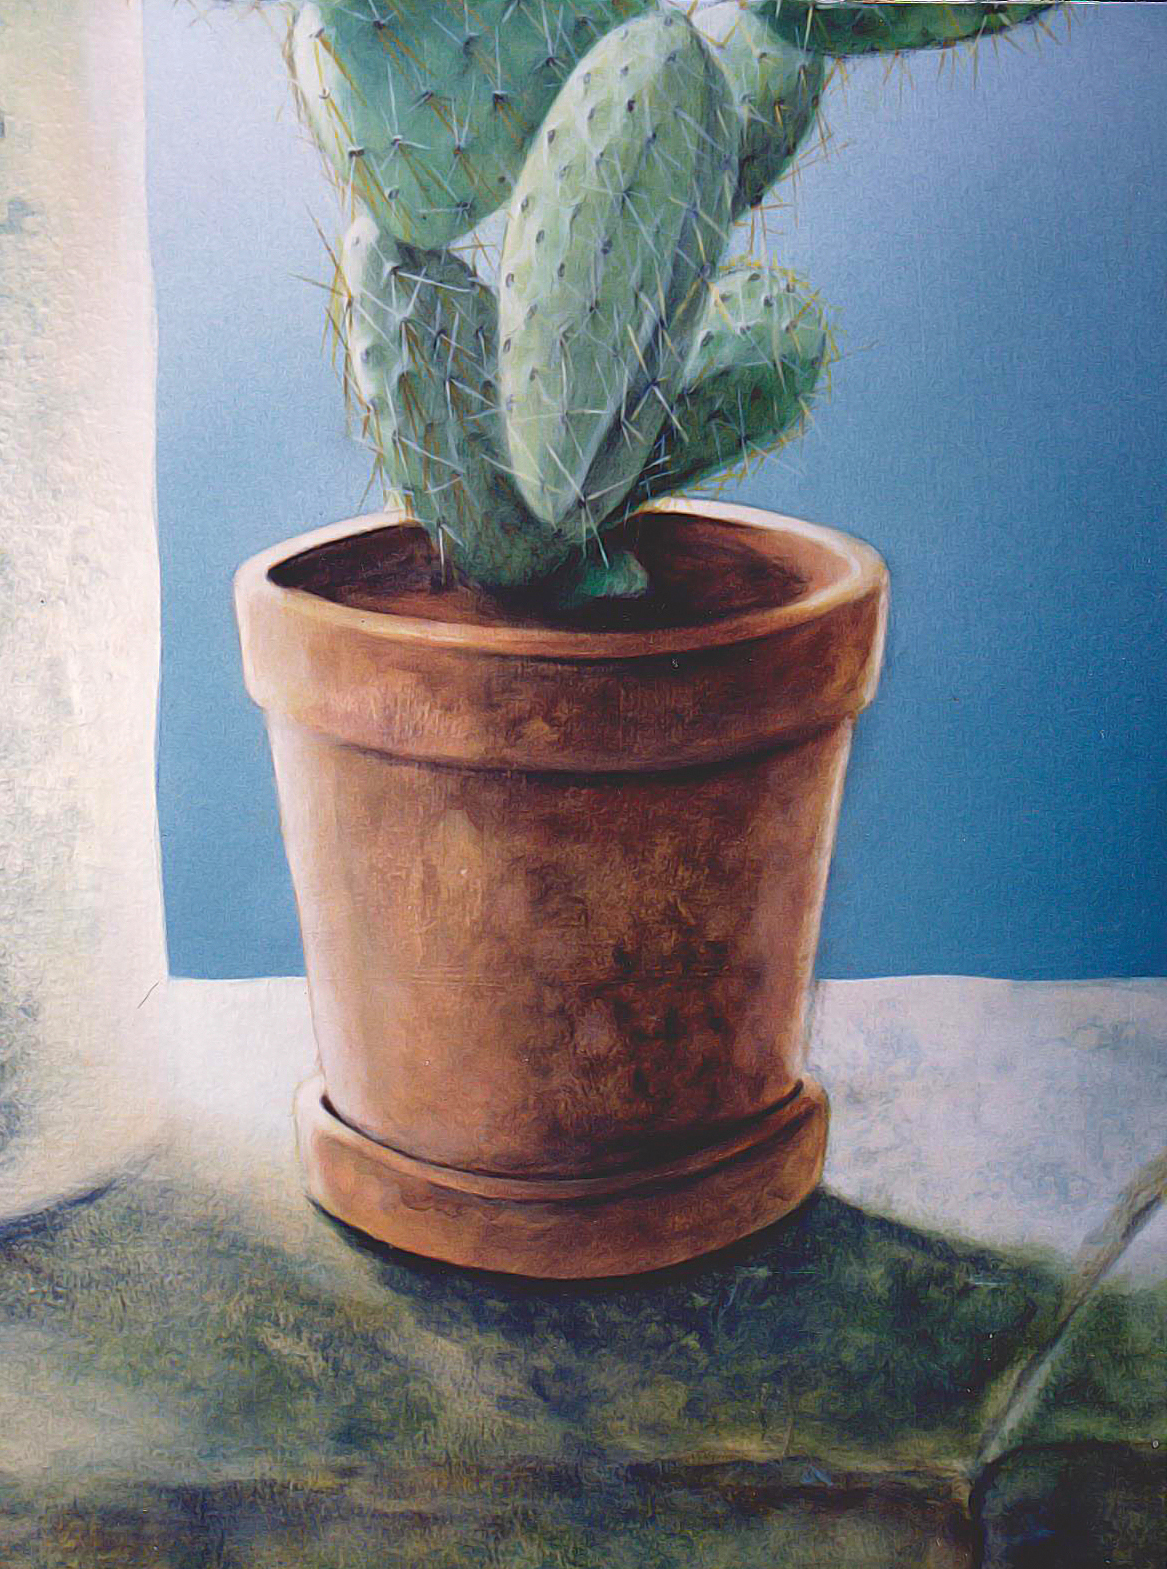 grosvenor-mural_cactuspot-closeup_1994